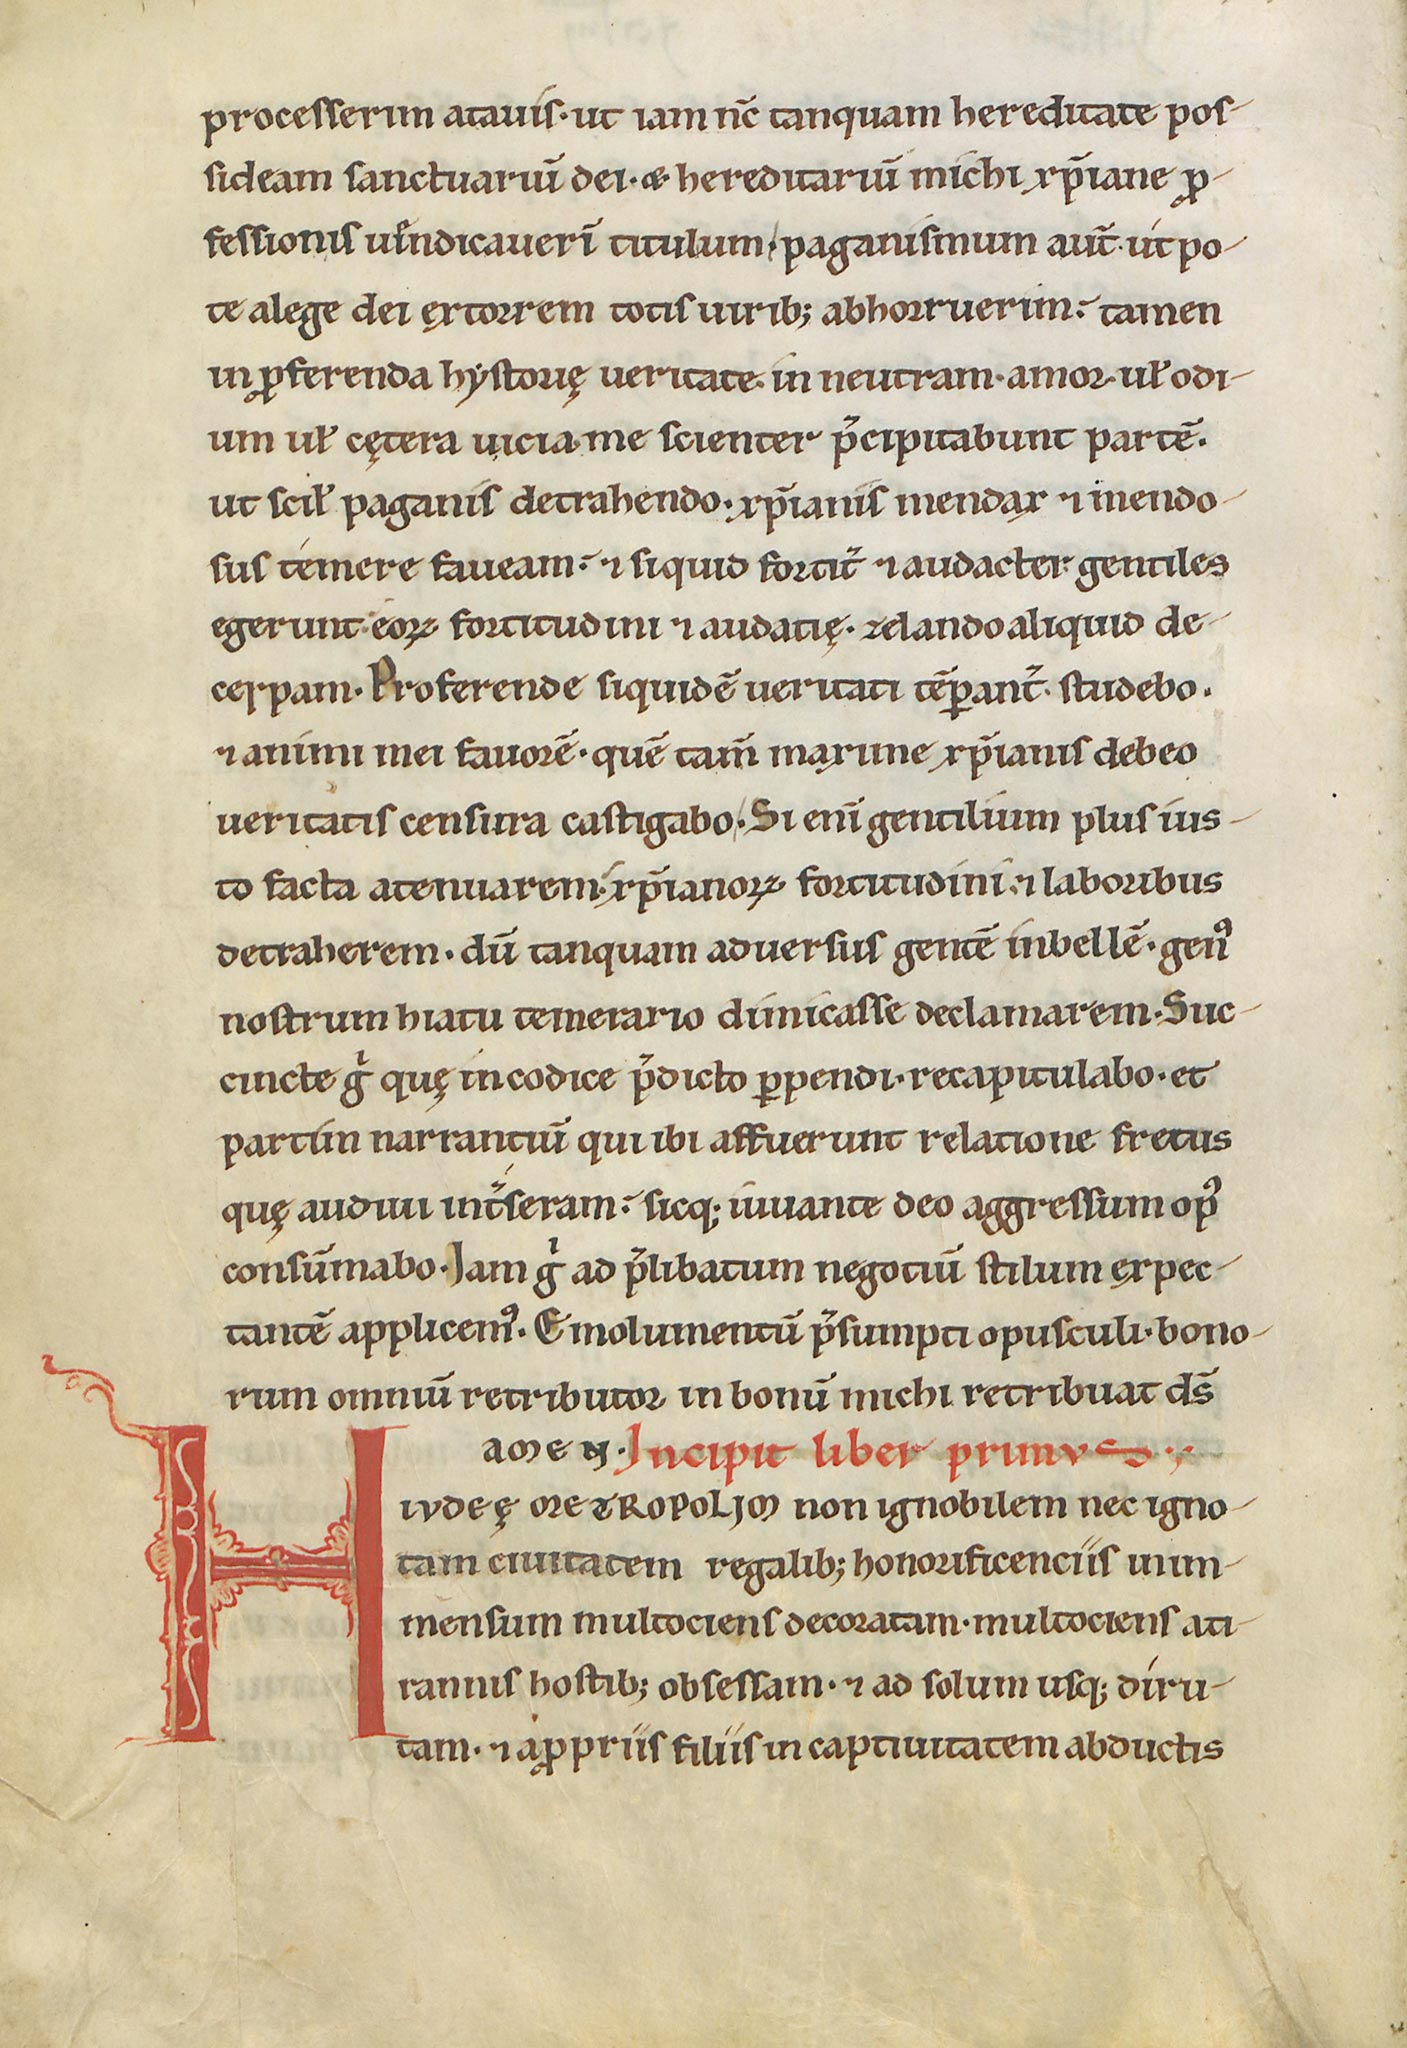 Manuscrit-Historia-Hierosolimitana-20v°